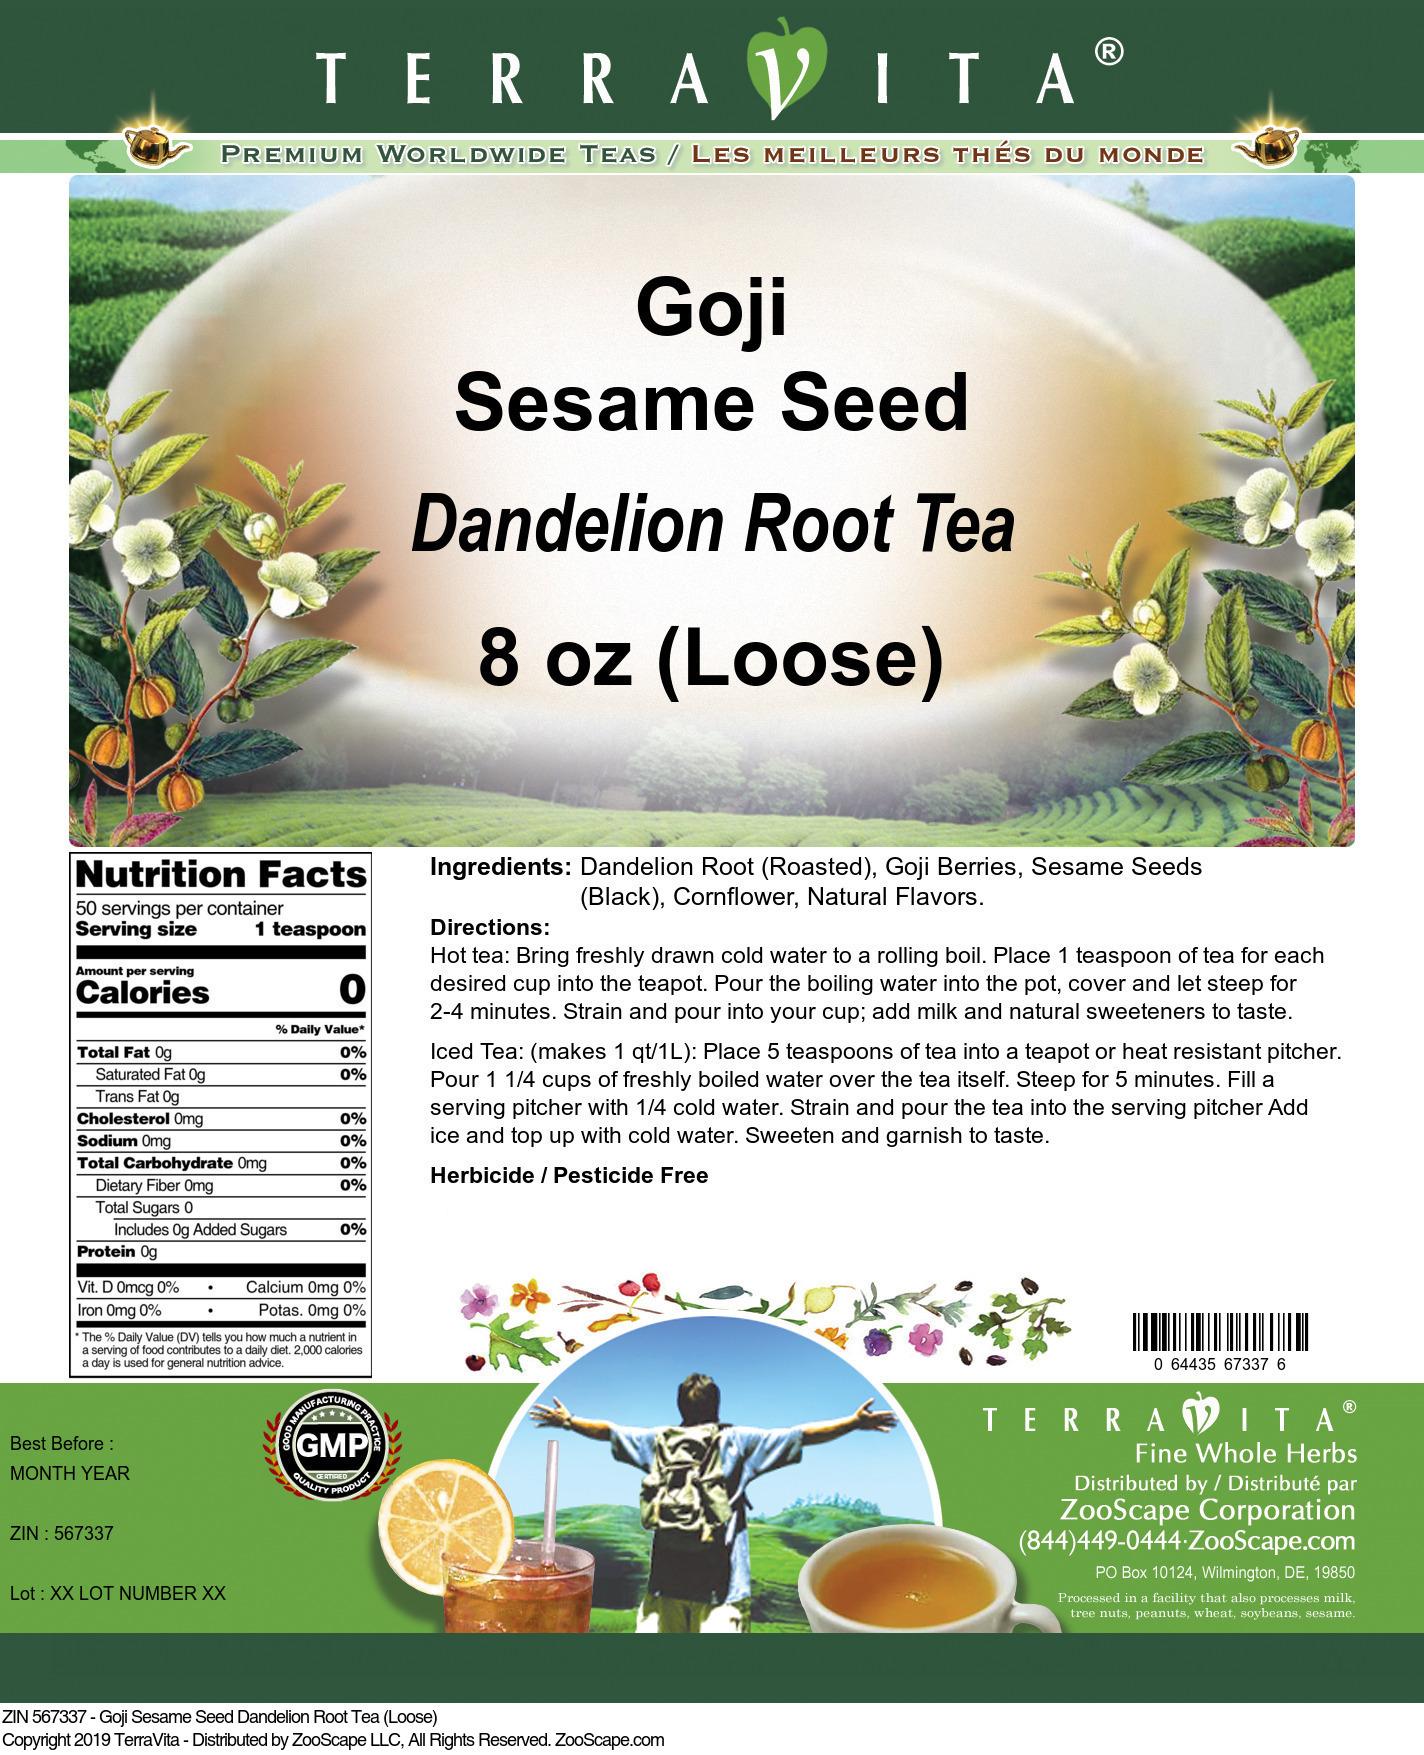 Goji Sesame Seed Dandelion Root